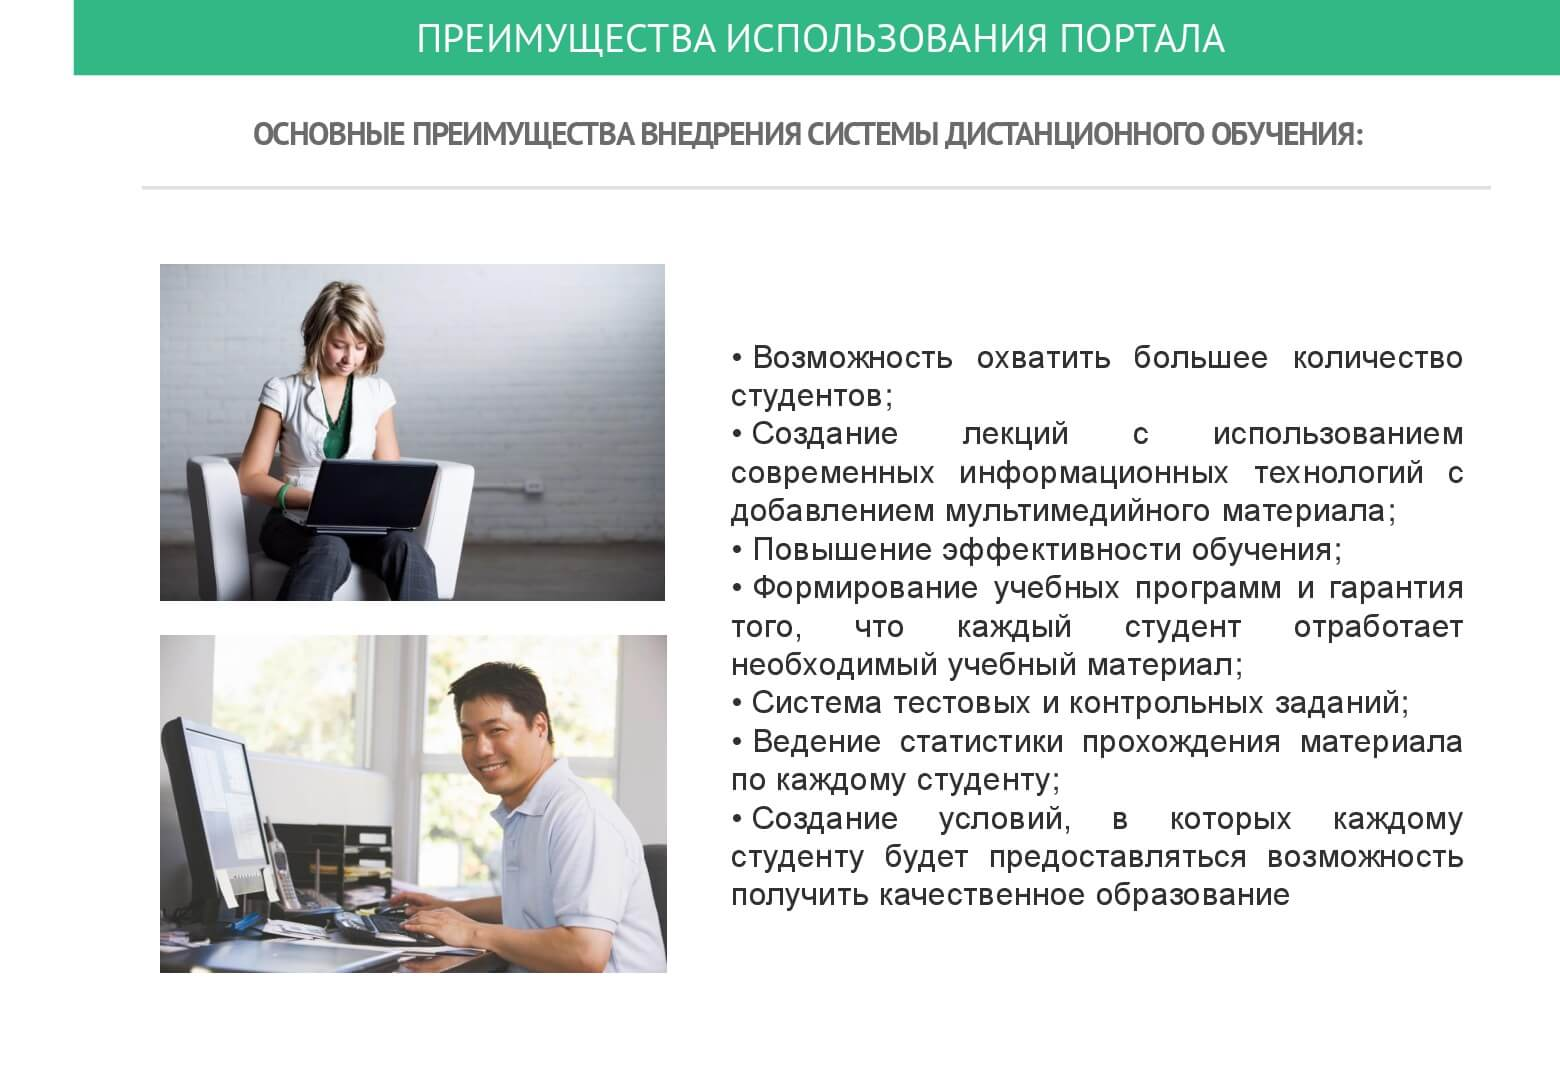 15_pdfsam_pres_SDO_23.10.13_v3